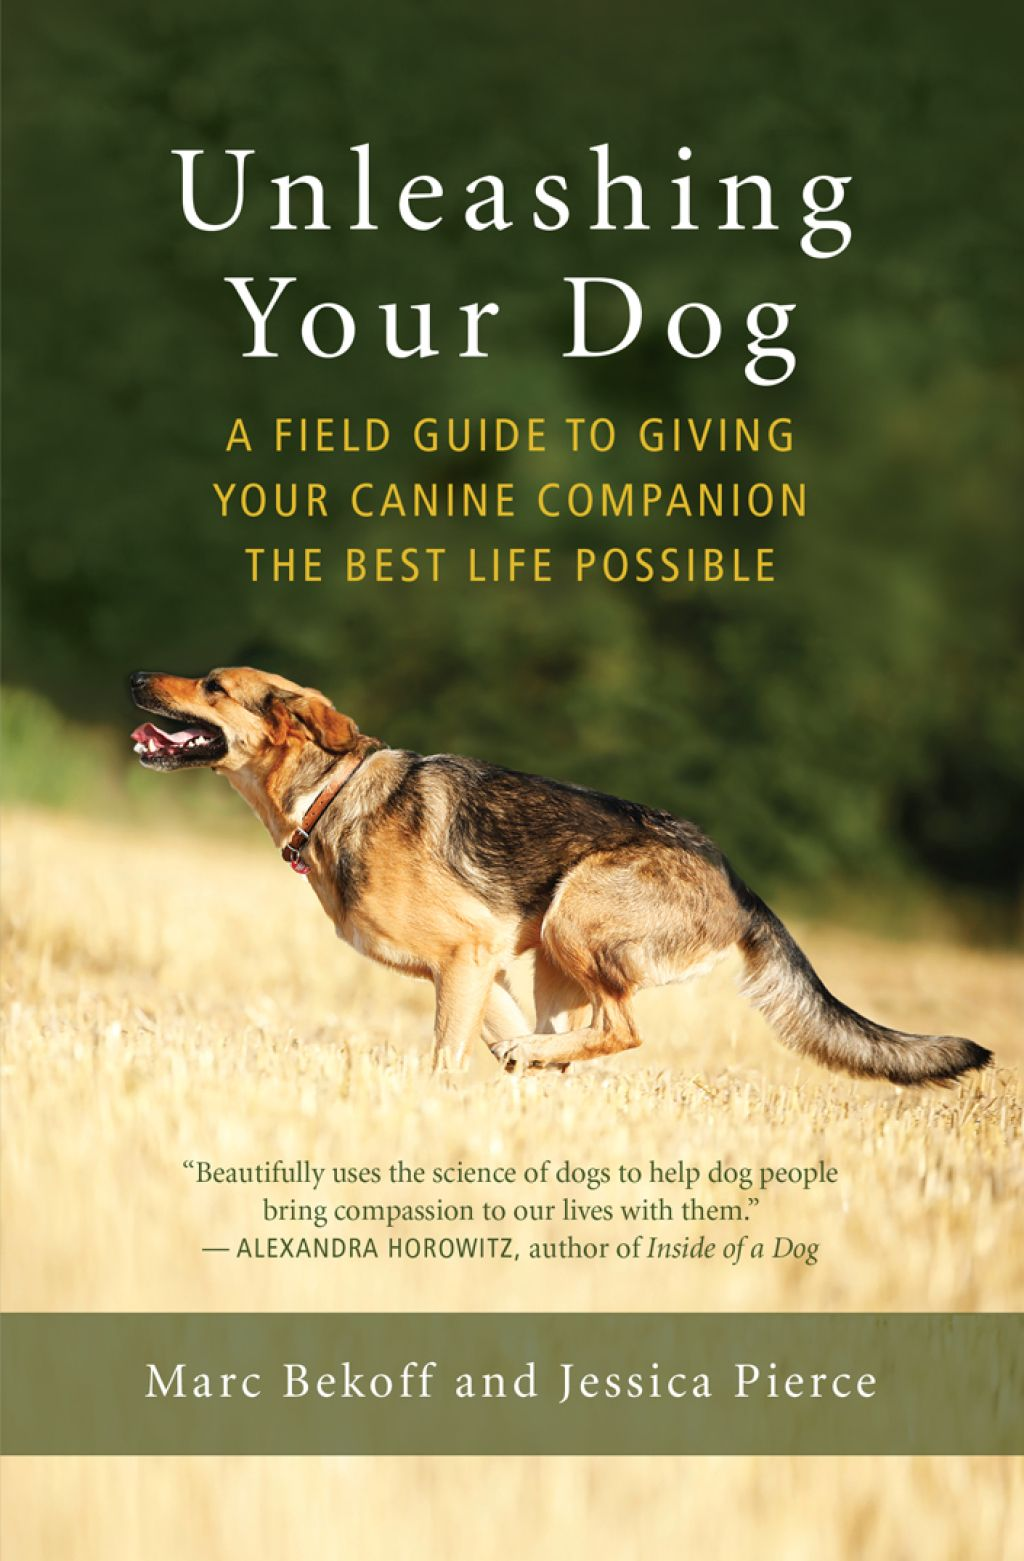 Unleashing Your Dog Ebook Aggressive Dog Dog Behavior Dog Lovers